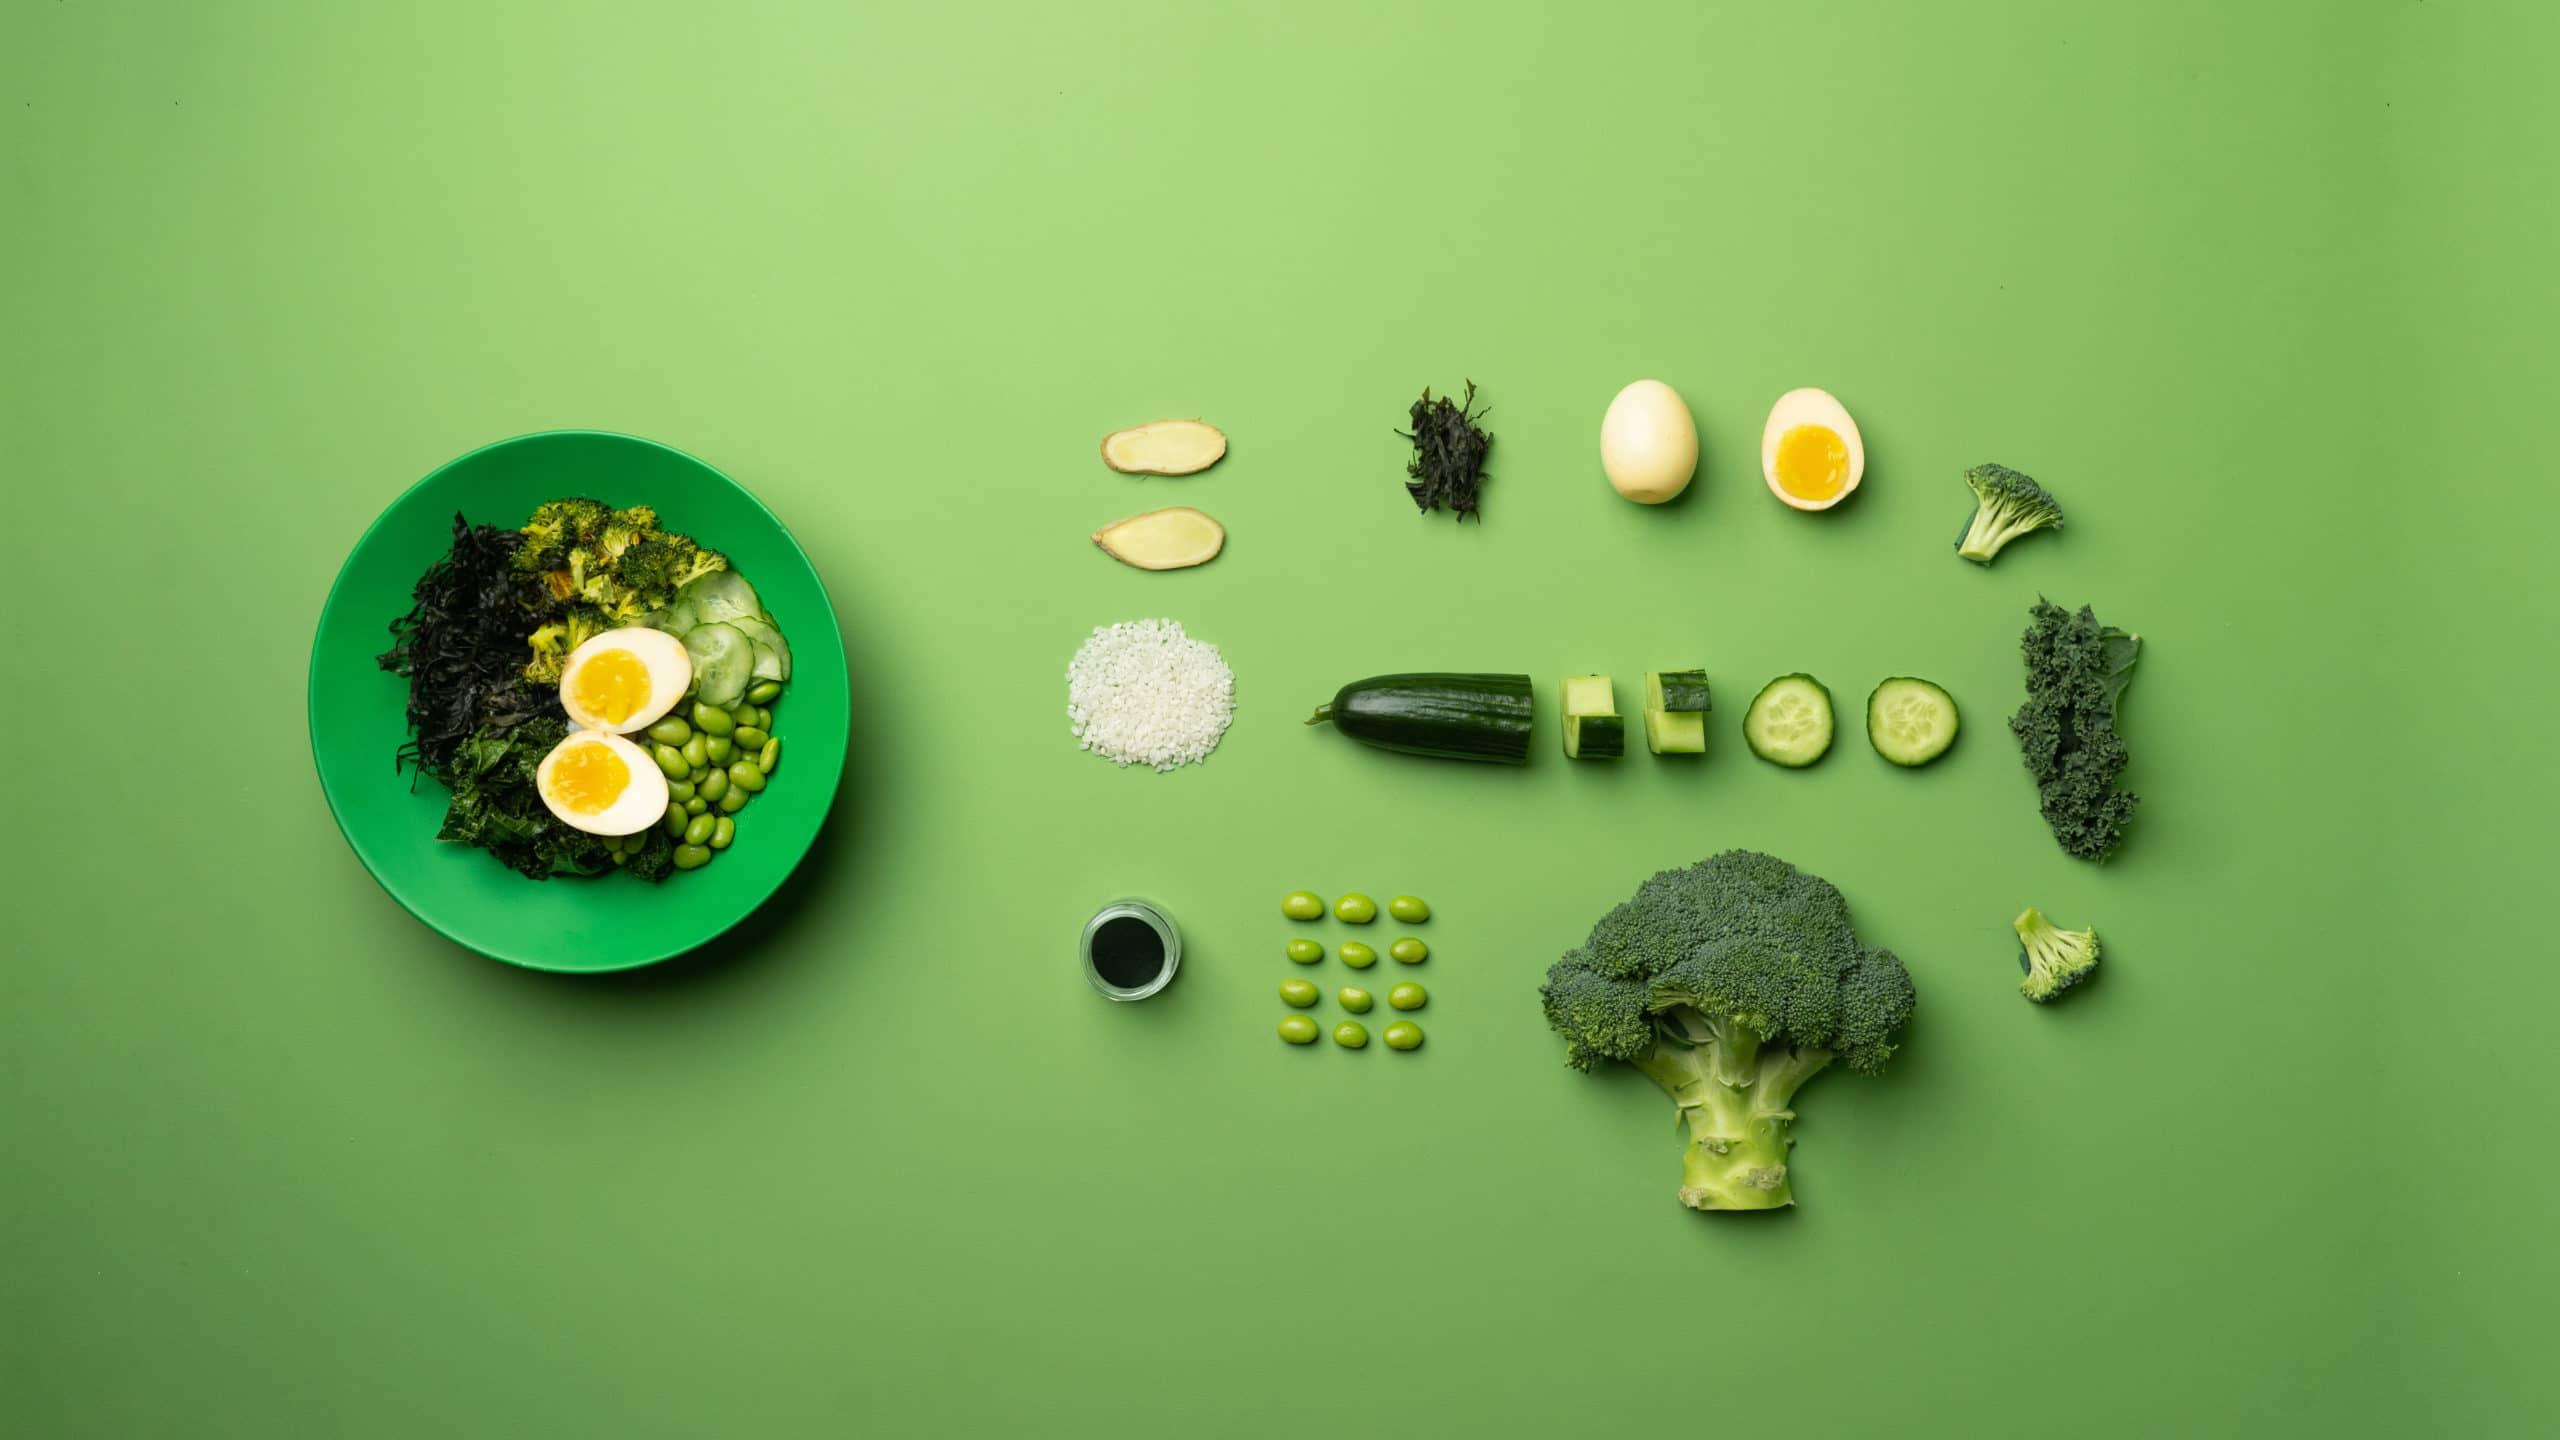 Decomposition du bowl Green Love Moko Moko Gardlab